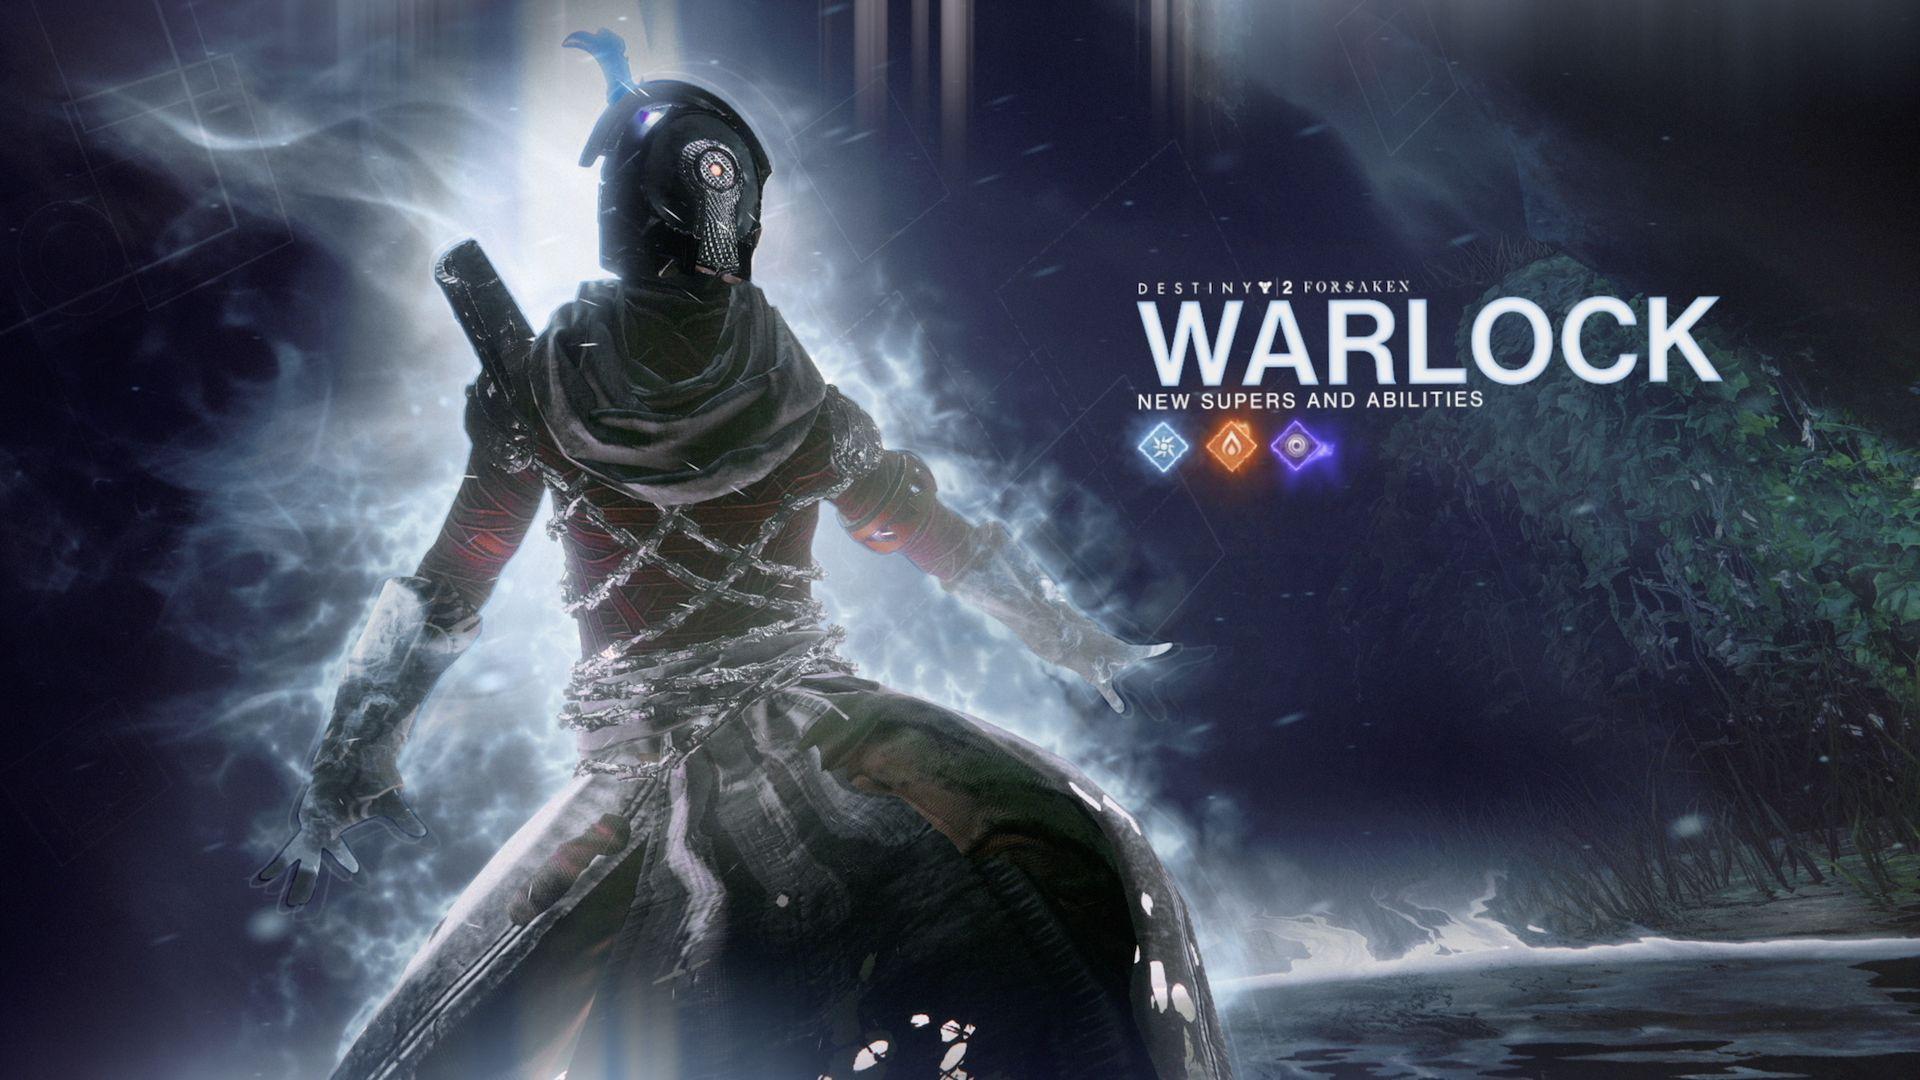 Destiny 2 Warlock Wallpapers Top Free Destiny 2 Warlock